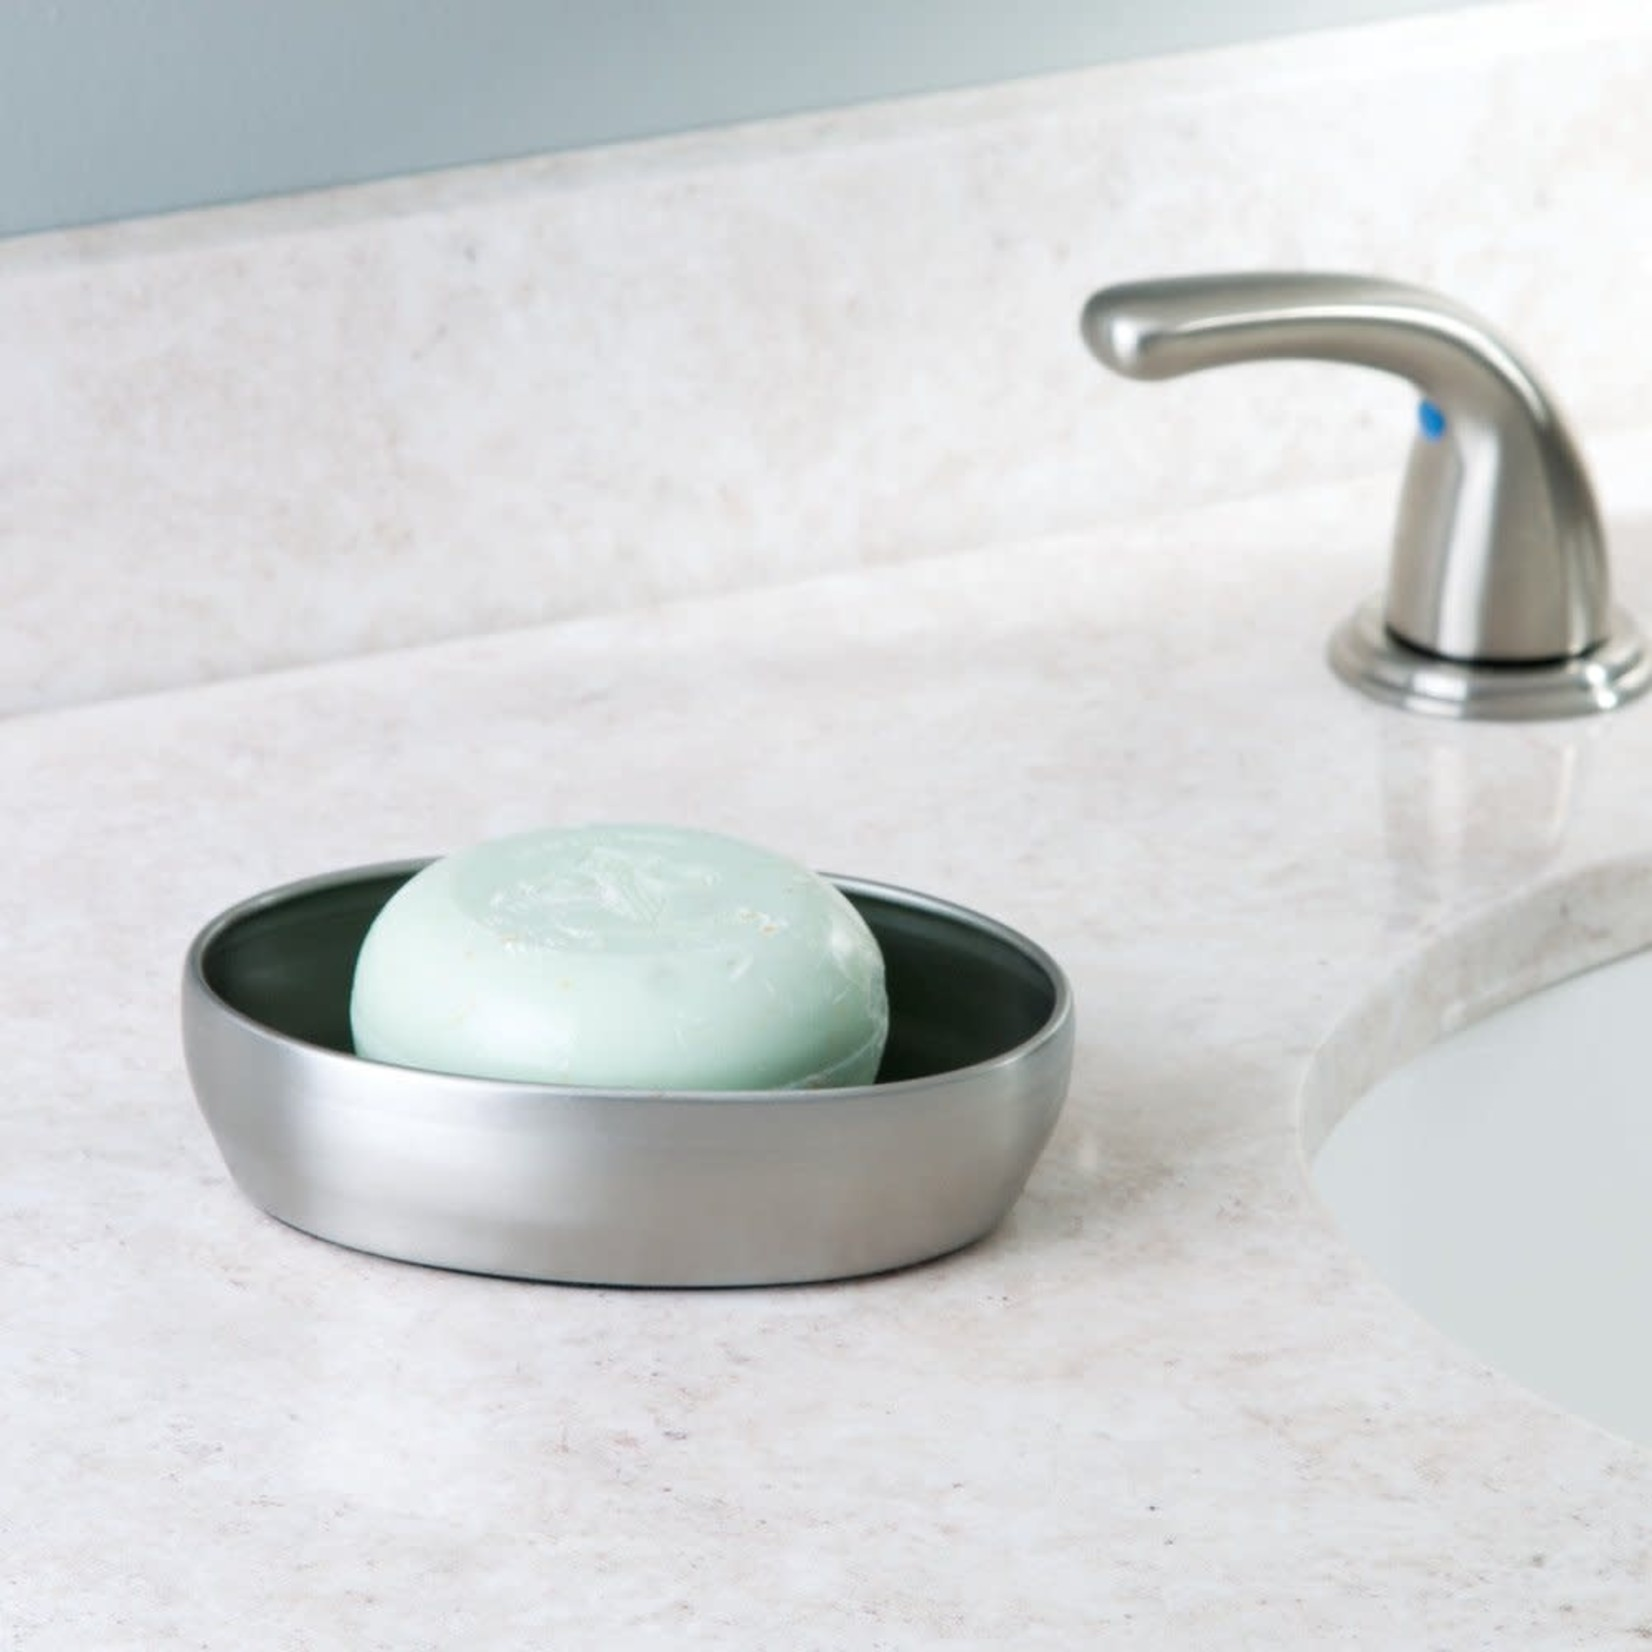 Interdesign Avery Soap Dish